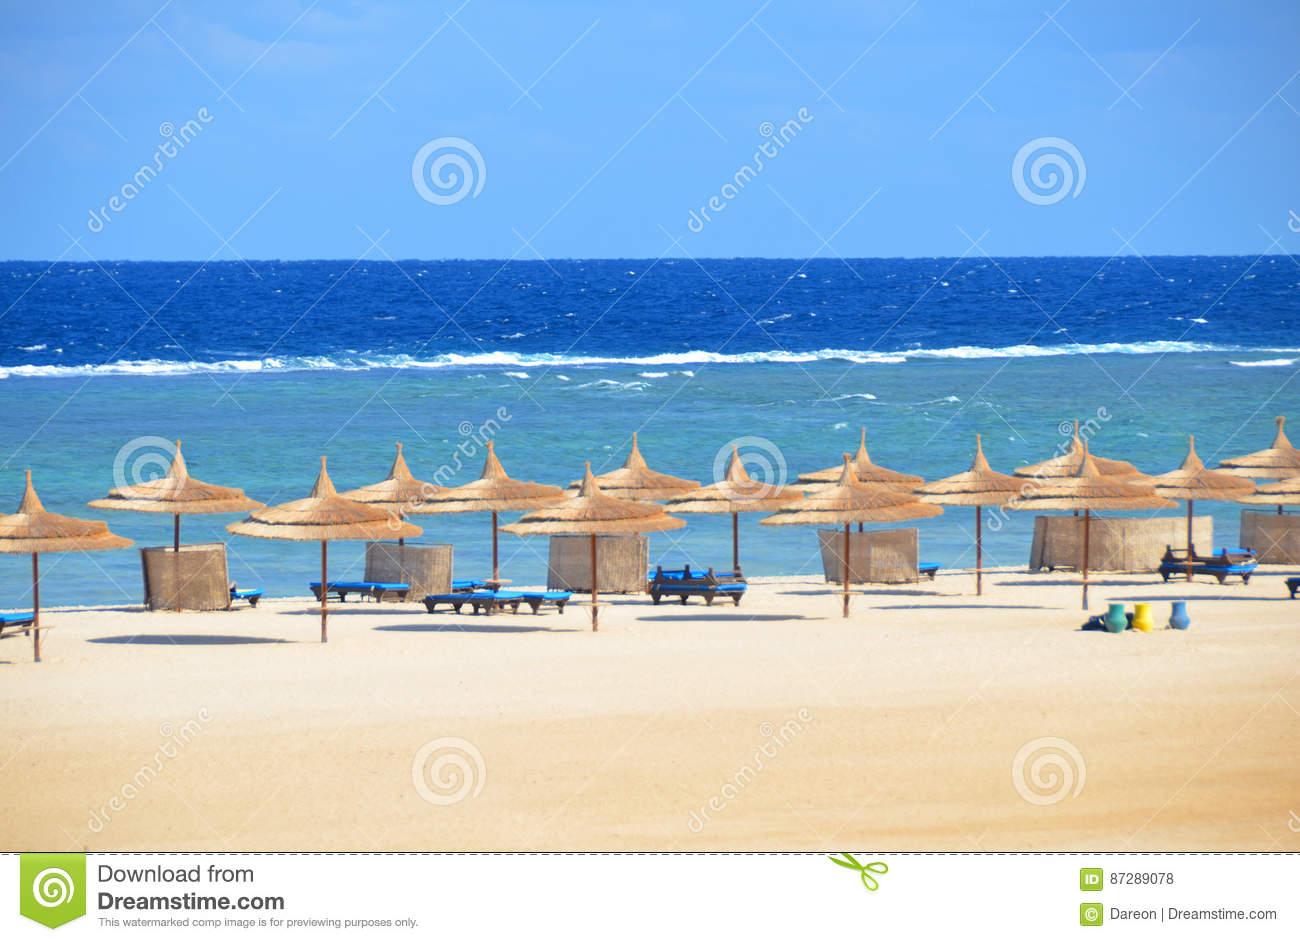 Beach clipart sandy beach. Resort pencil and in